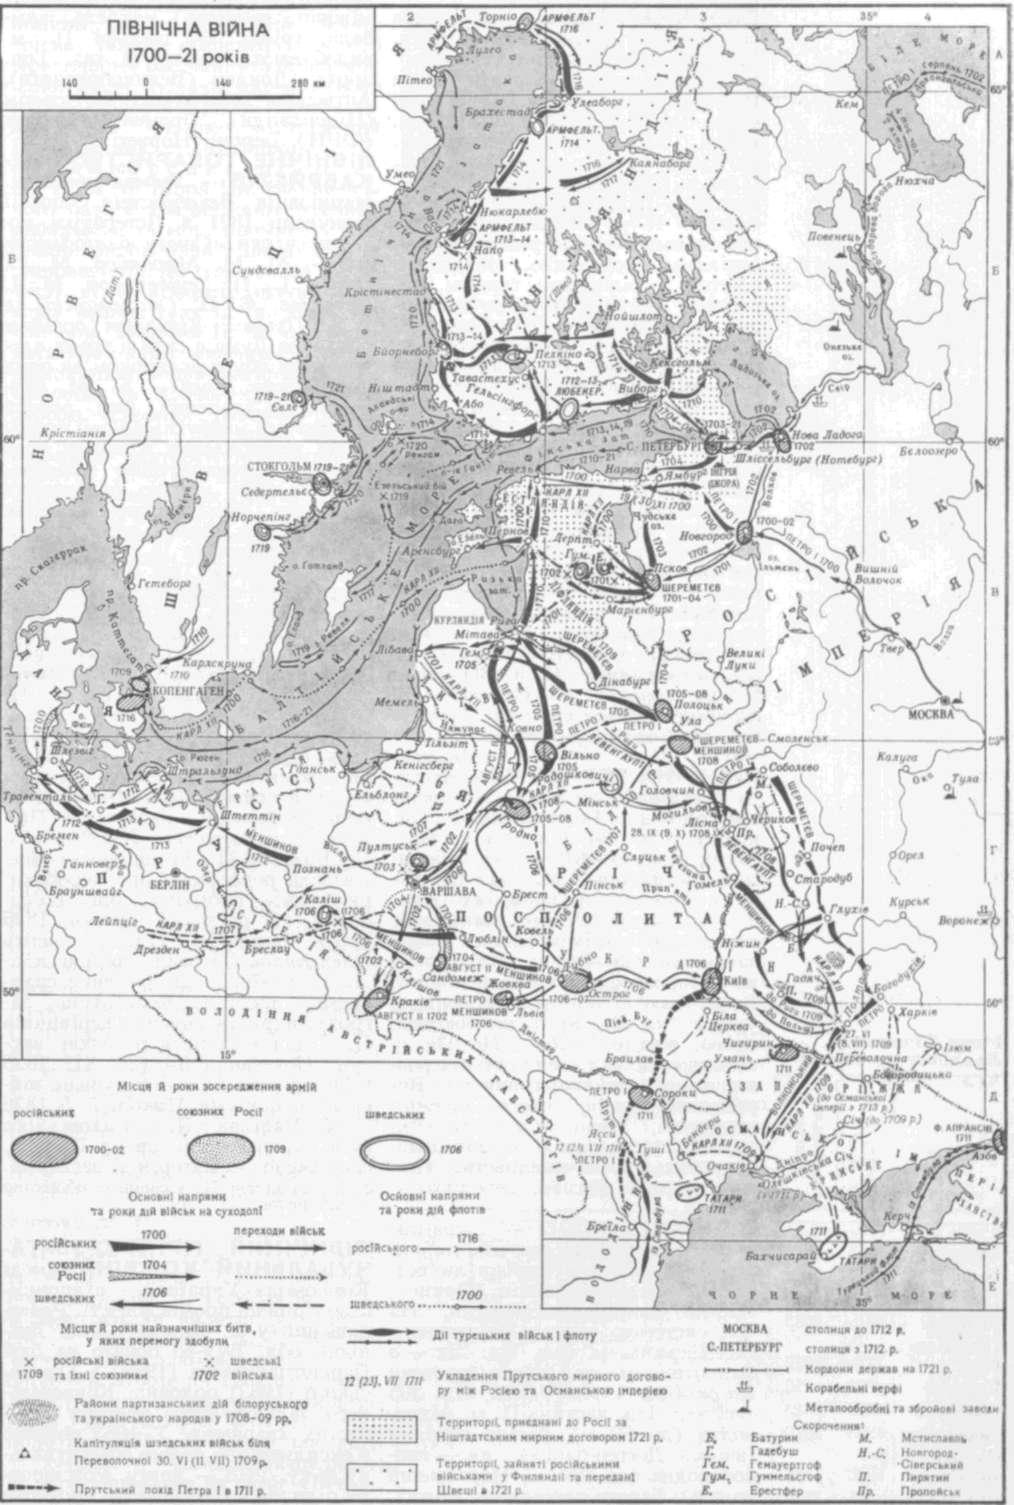 Північна війна 1700—21 - leksika.com.ua